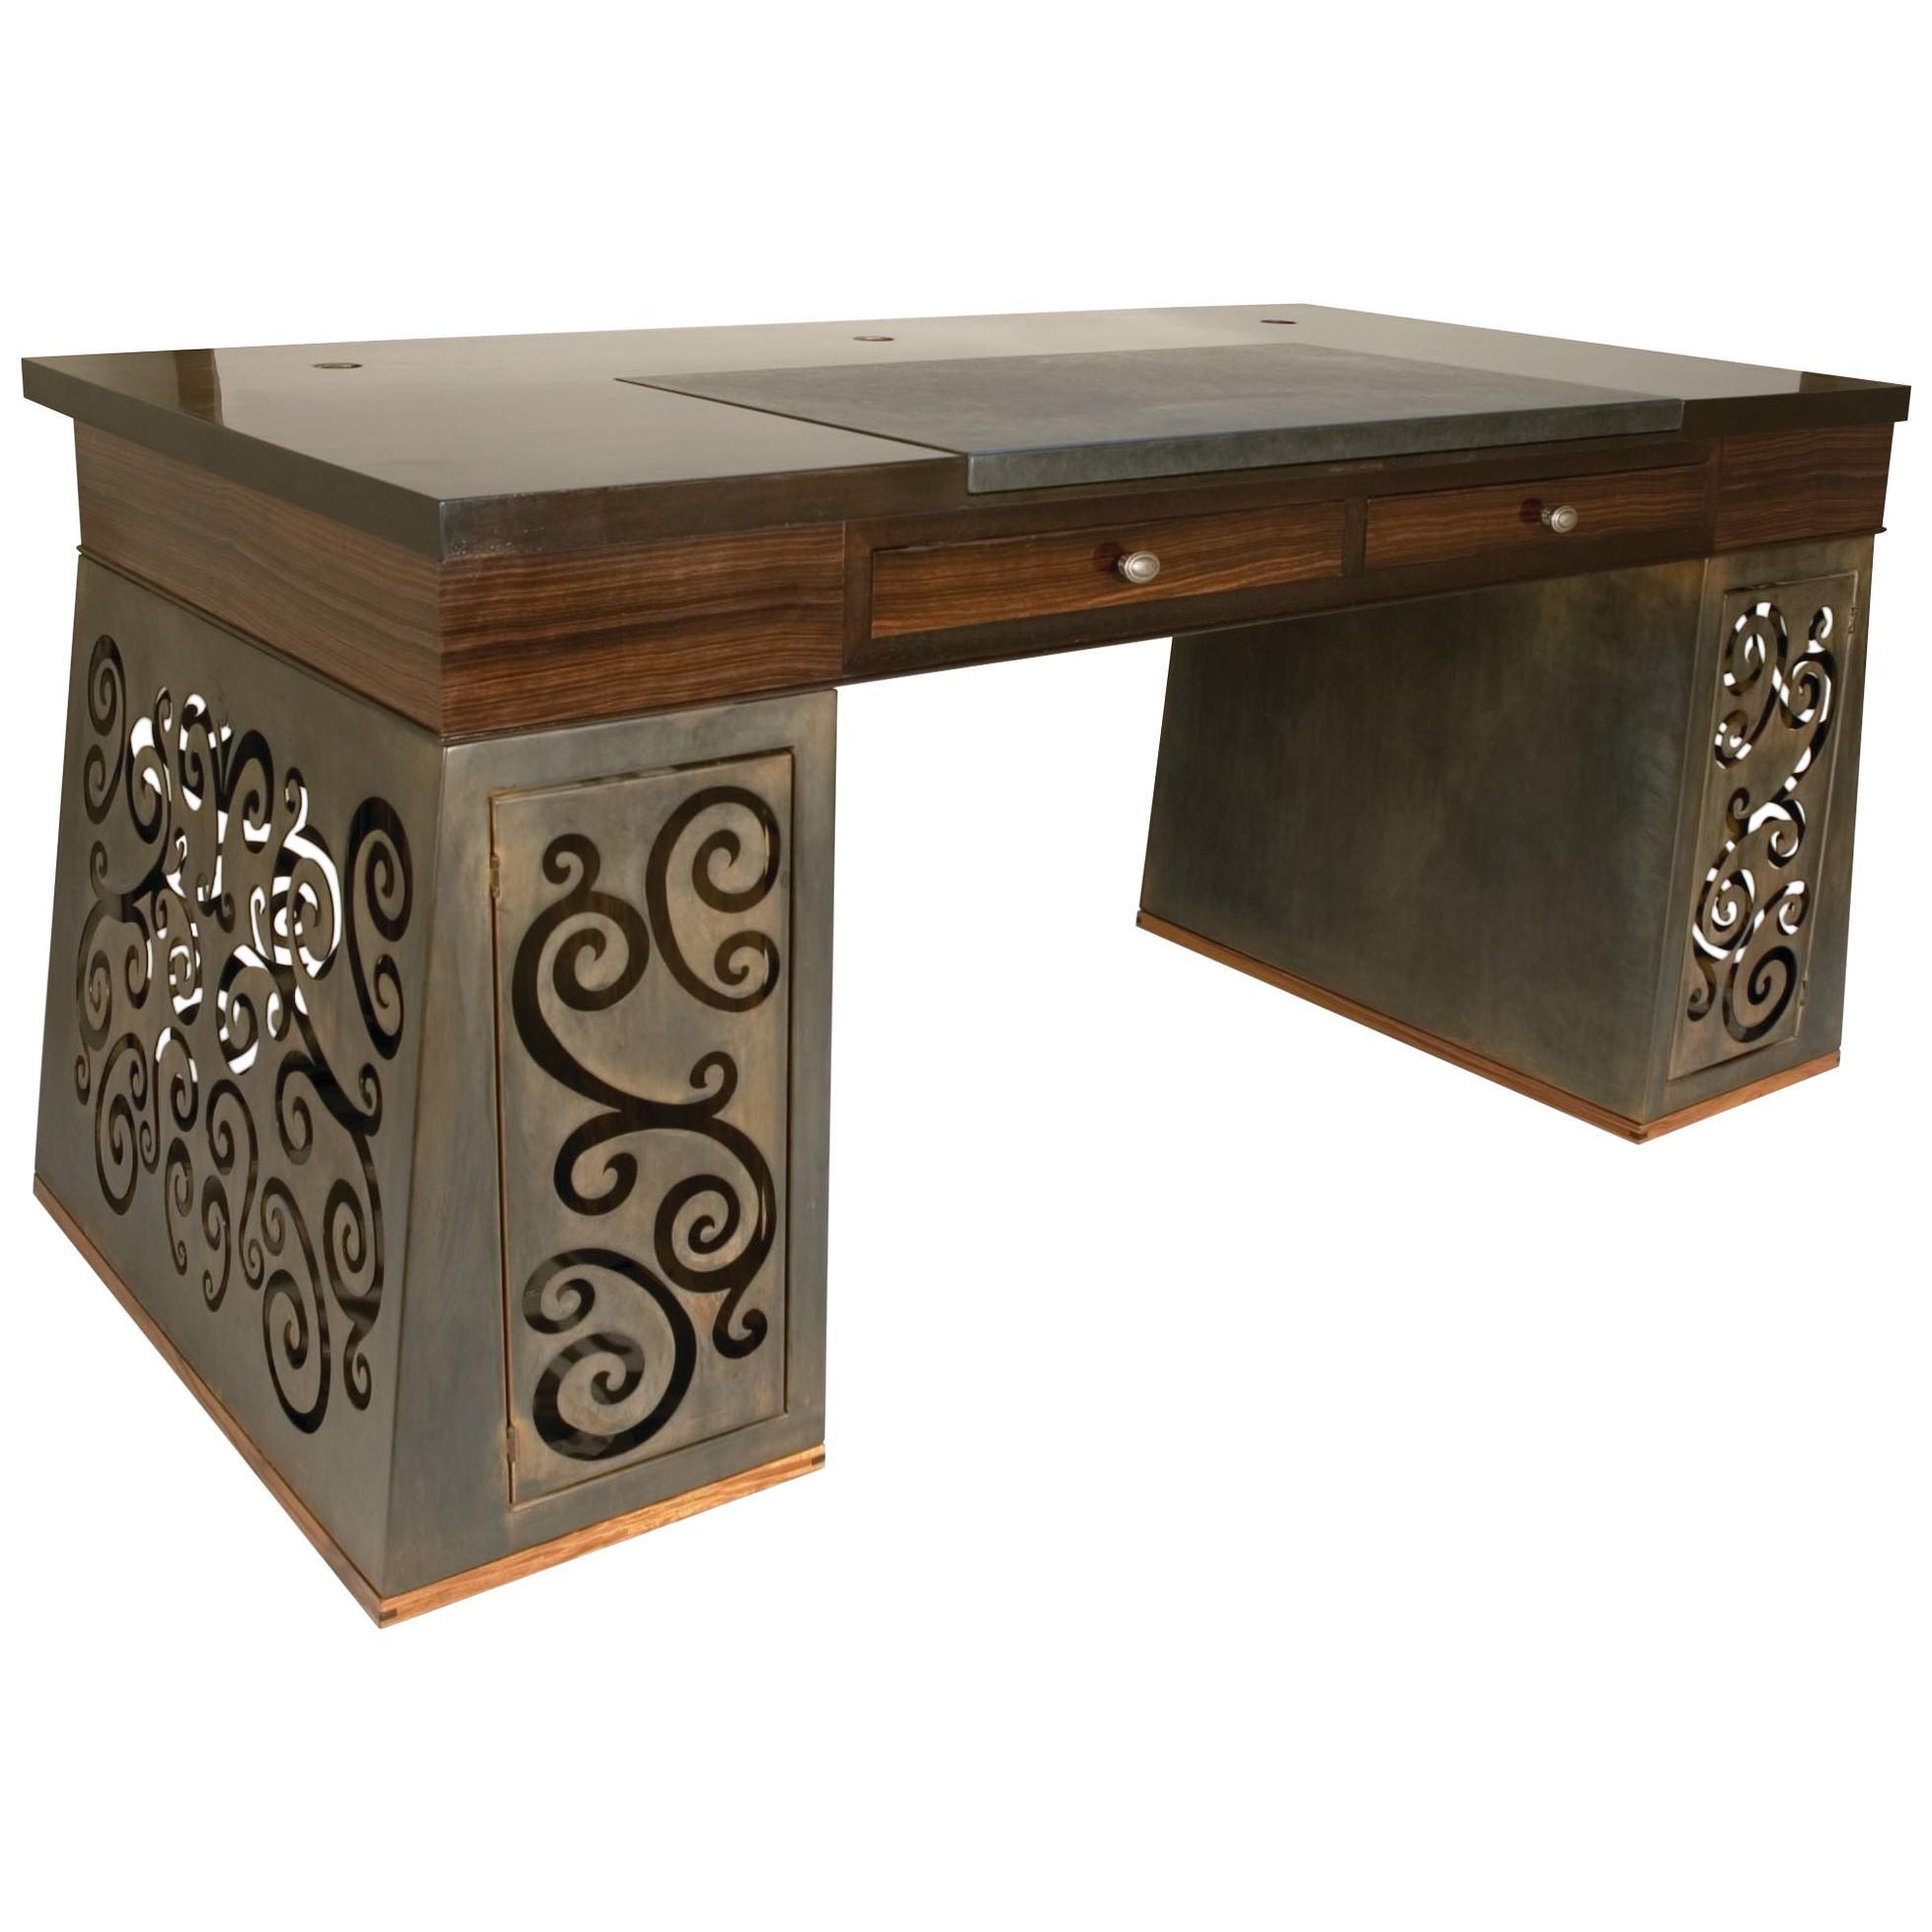 Mixed-Media Scroll-Work Patinated Steel and Macassar Ebony Desk